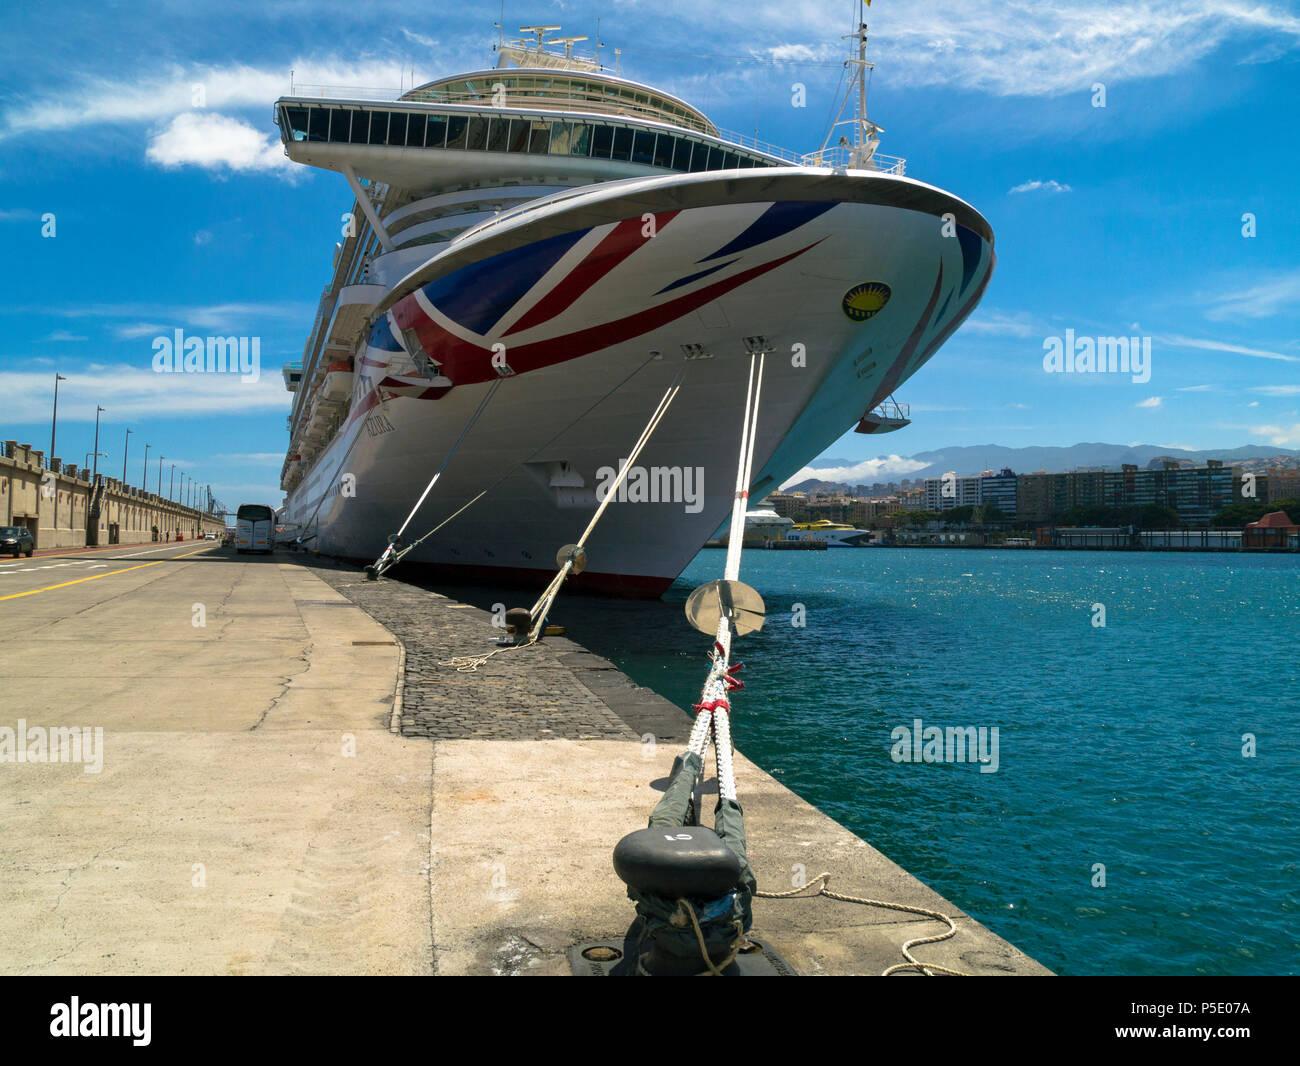 P&O cruise ship Azura in  Las Palmas de Gran Canaria, Canary Islands, Canaries - Stock Image